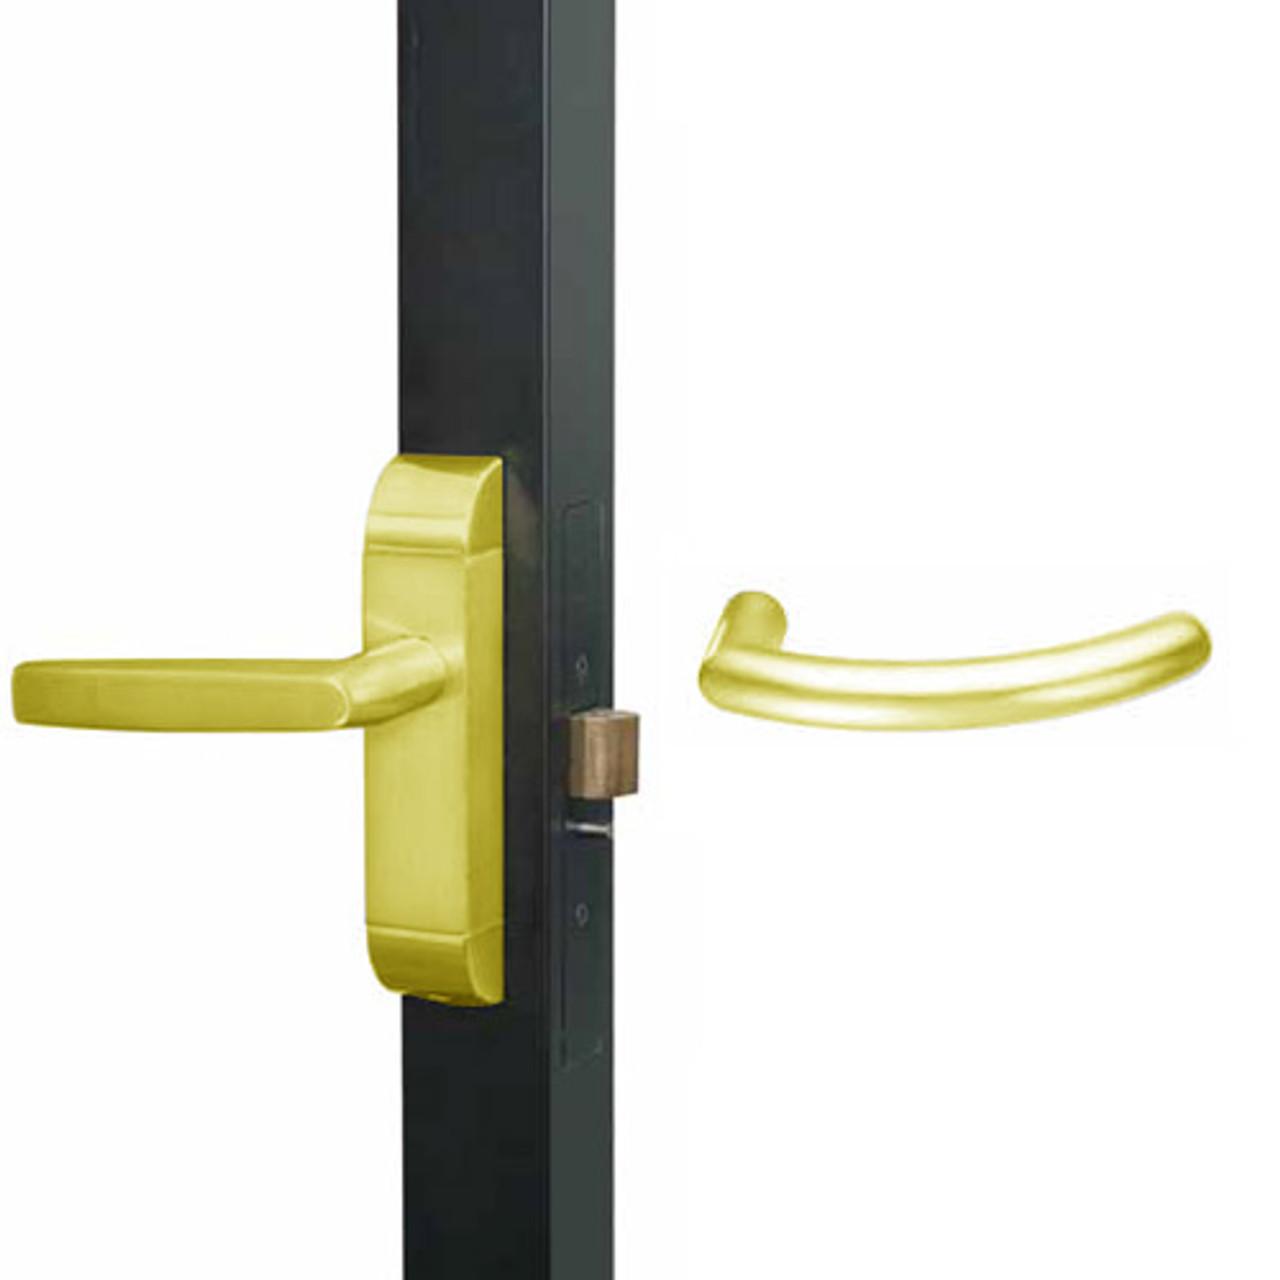 4600-MG-611-US3 Adams Rite MG Designer Deadlatch handle in Bright Brass Finish